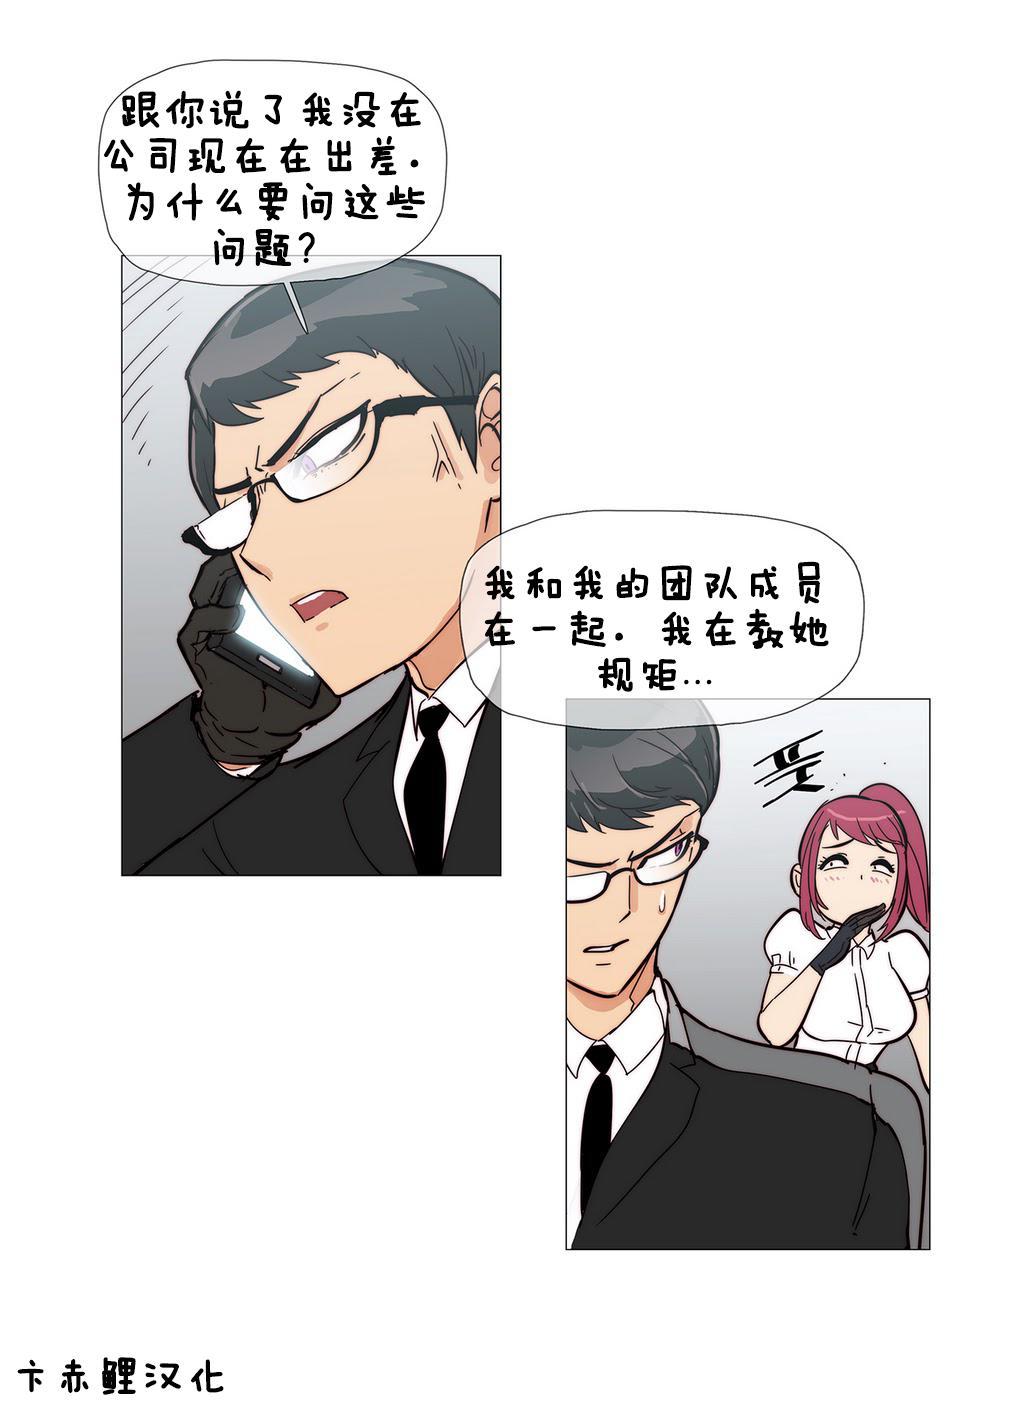 HouseHold Affairs 【卞赤鲤个人汉化】1~33话(持续更新中) 86